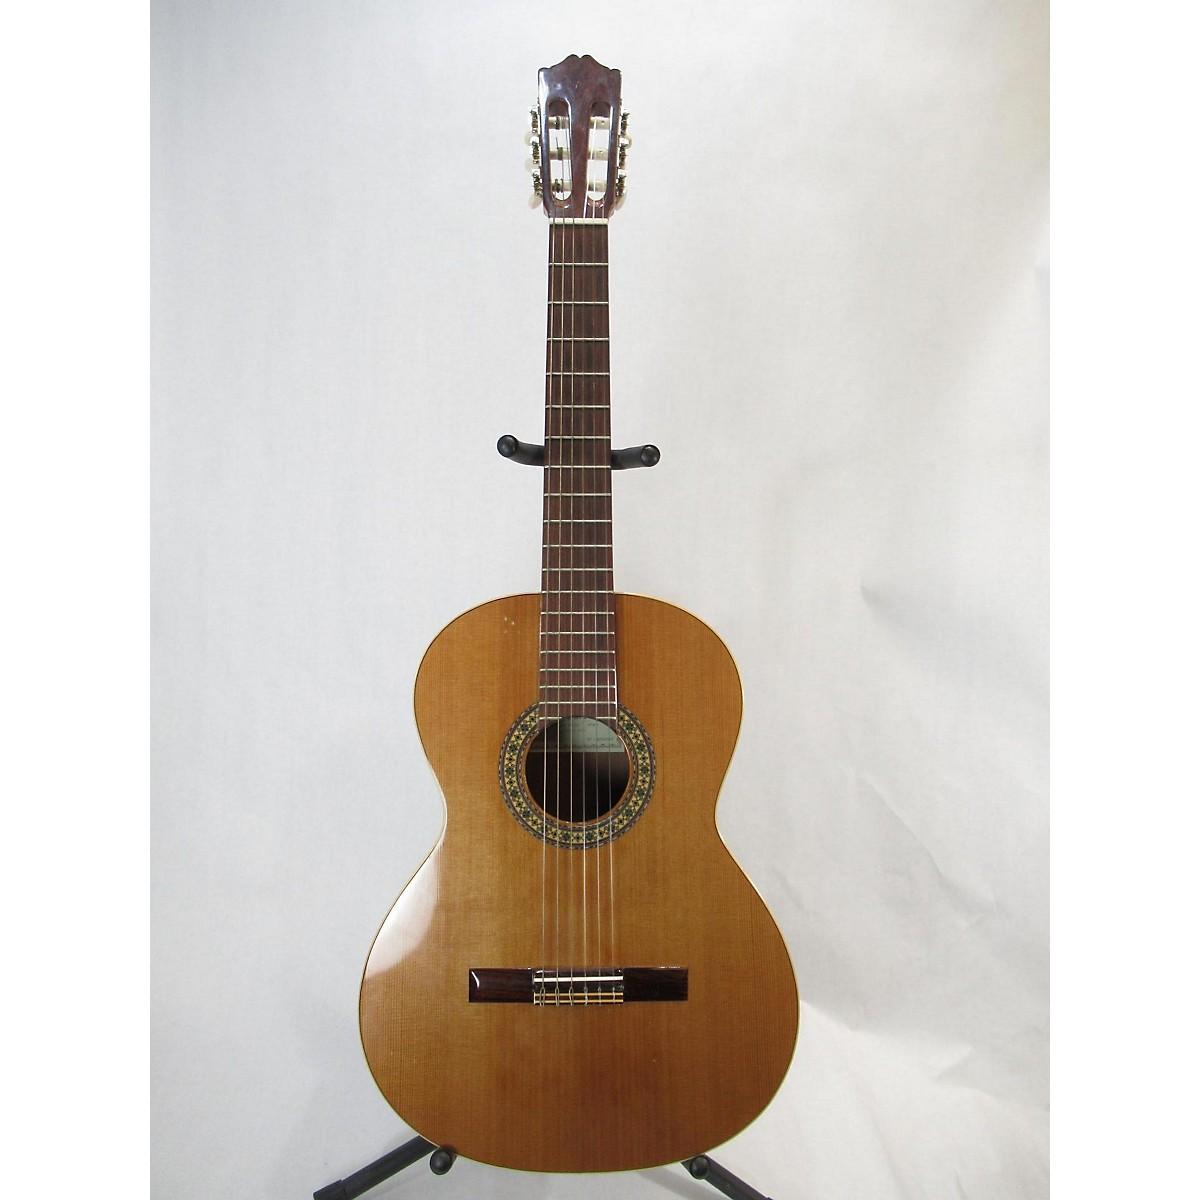 Alhambra 2C Classical Acoustic Guitar